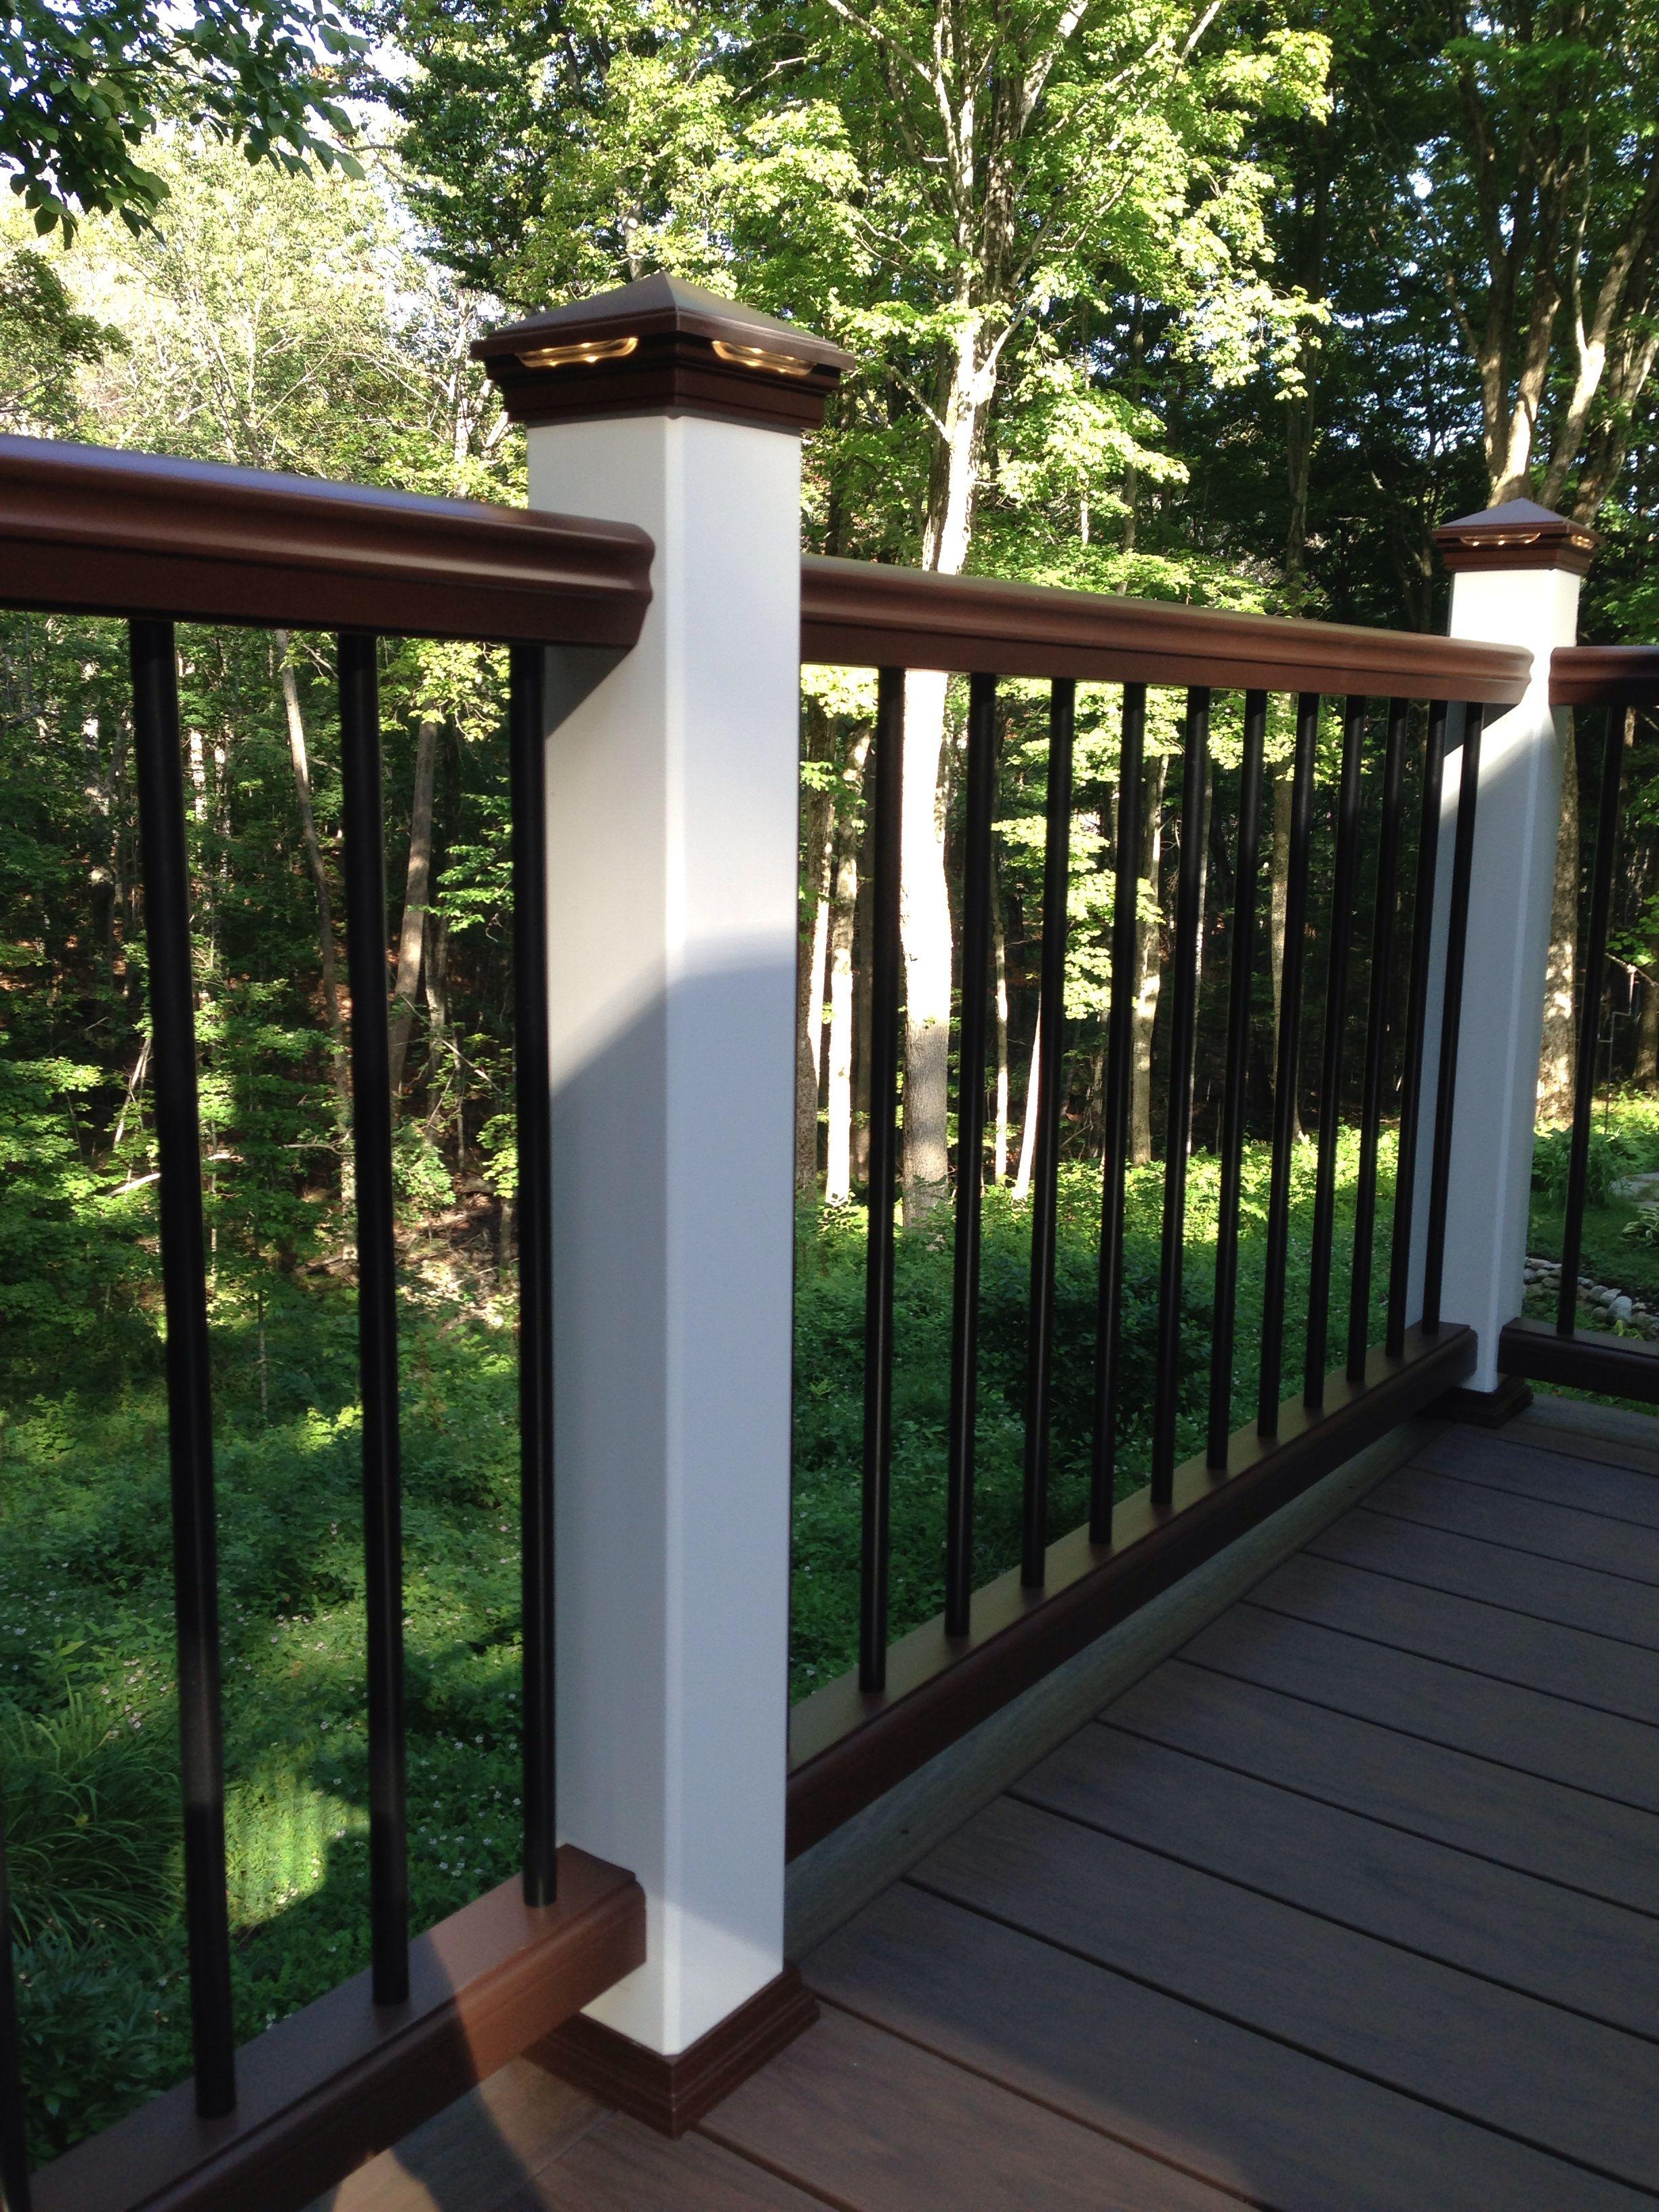 50 Deck Railing Ideas For Your Home 30 Deck Railing Design